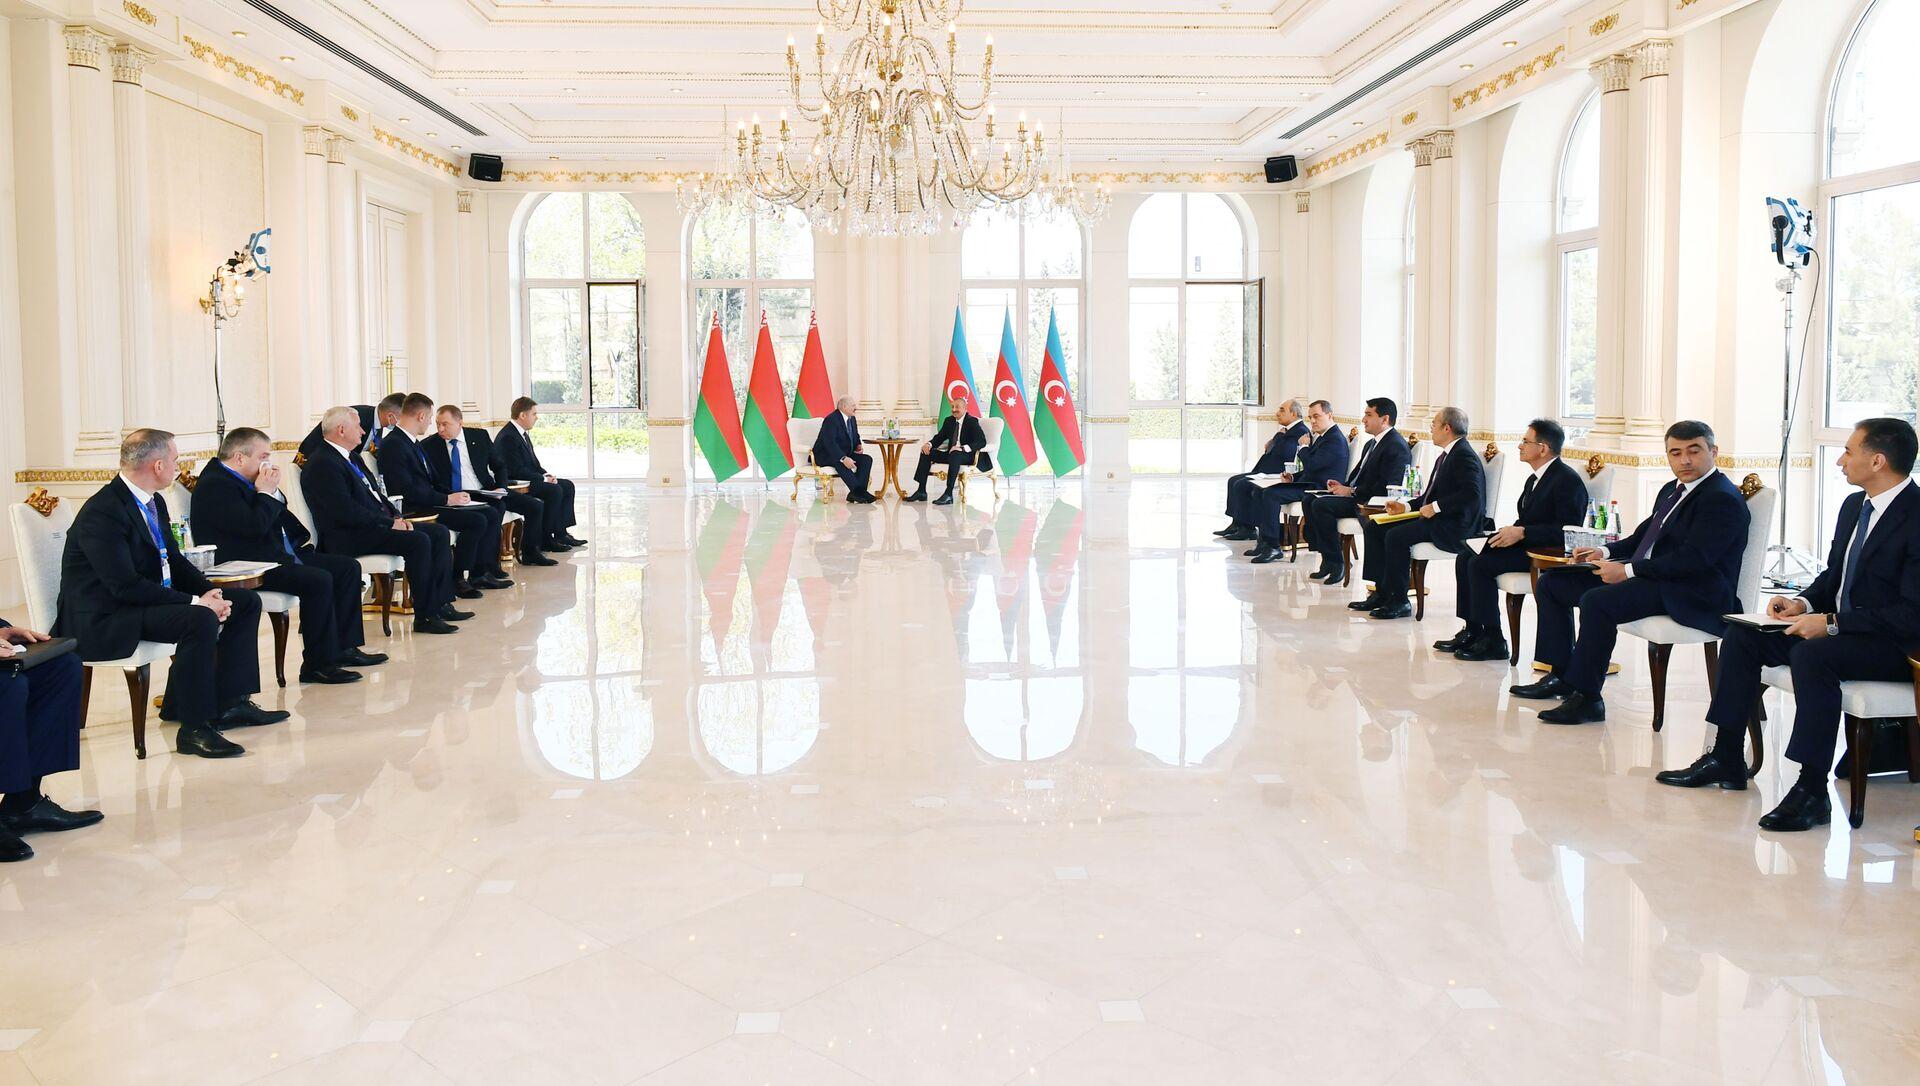 Президент Азербайджанской Республики Ильхам Алиев и Президент Беларуси Александр Лукашенко - Sputnik Азербайджан, 1920, 15.04.2021